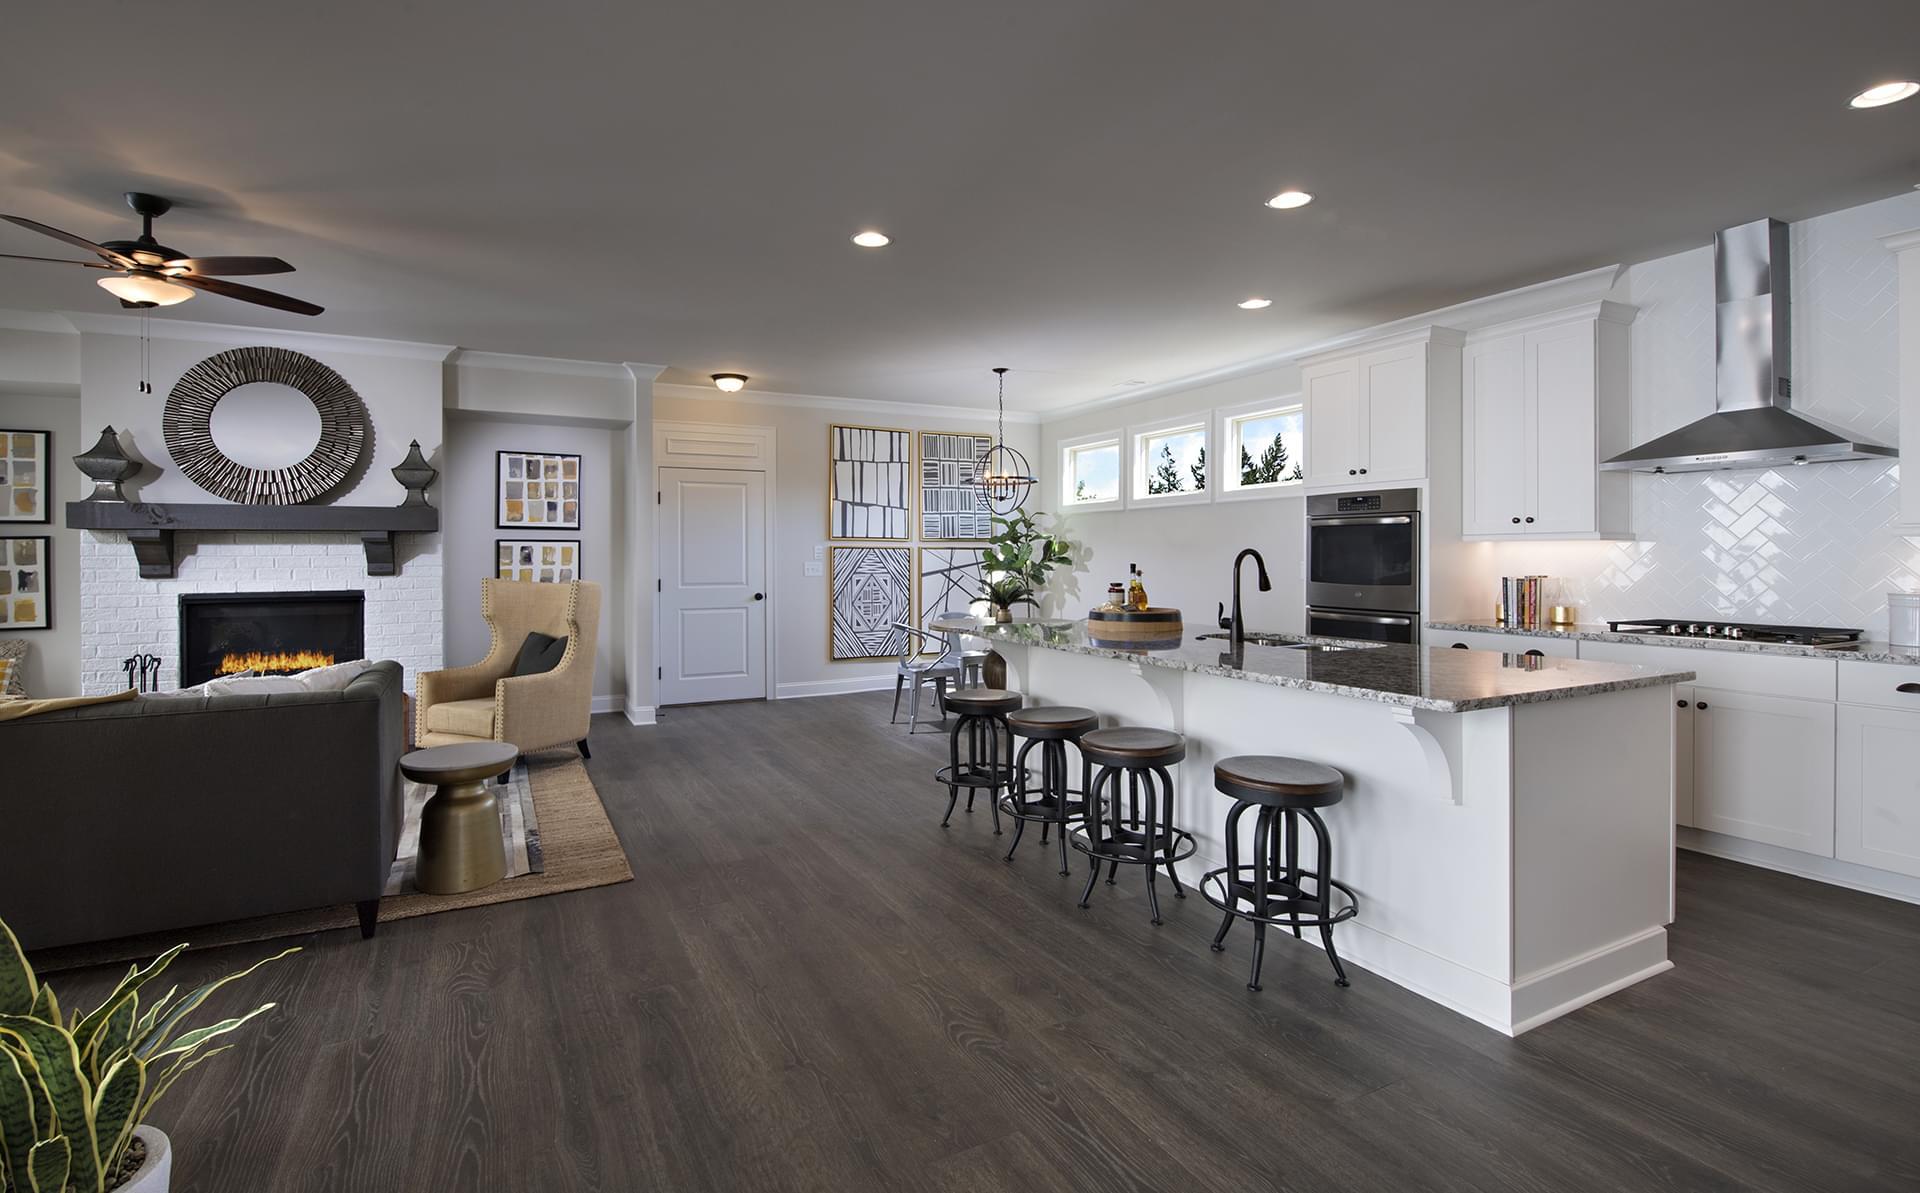 The Crestwick New Home in Johns Creek GA